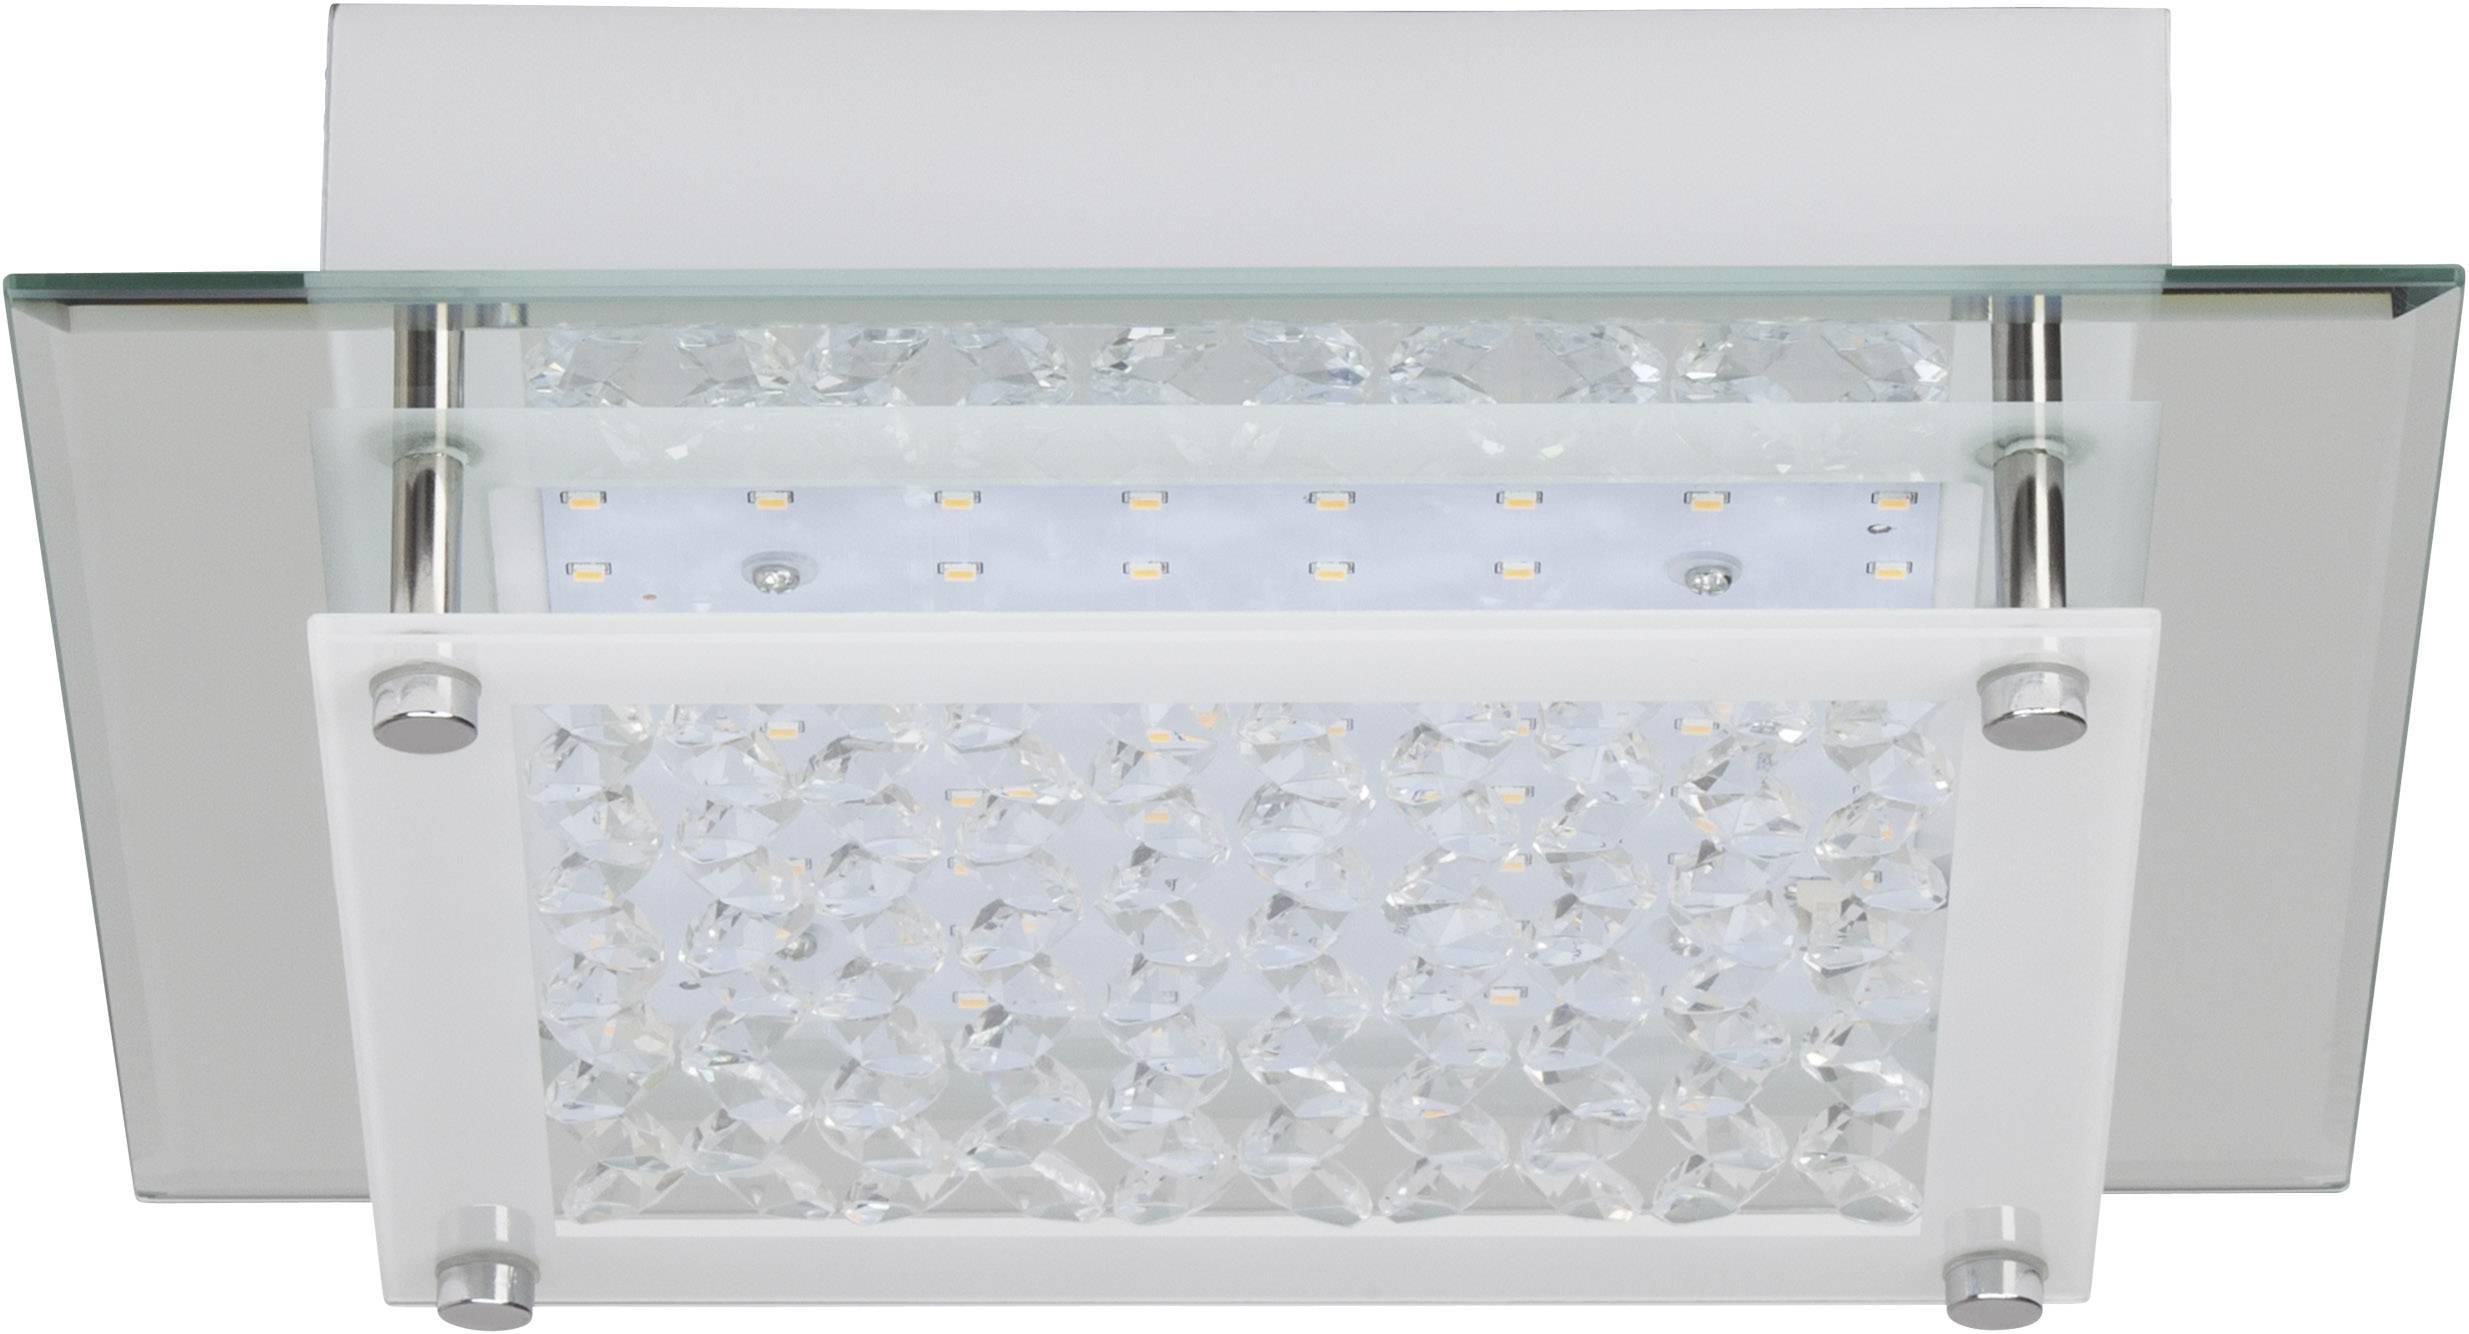 LED stropné svietidlo Brilliant Larina G94280/15, 12 W, teplá biela, chróm